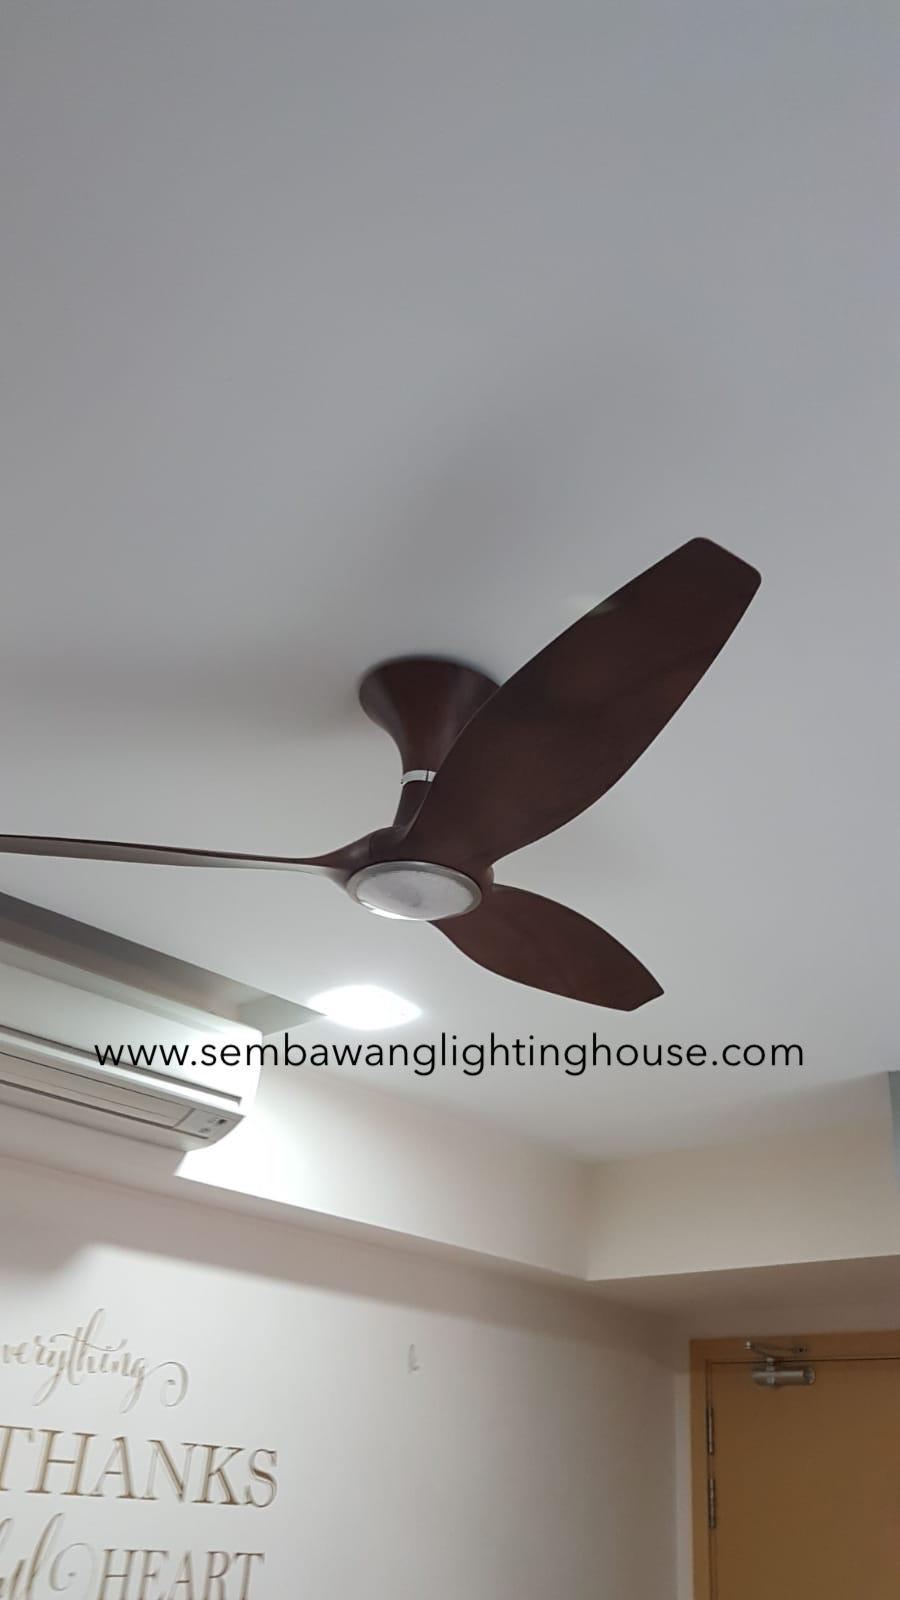 sample01-fanztec-breeze-dc-led-ceiling-fan-sembawang-lighting-house.jpg